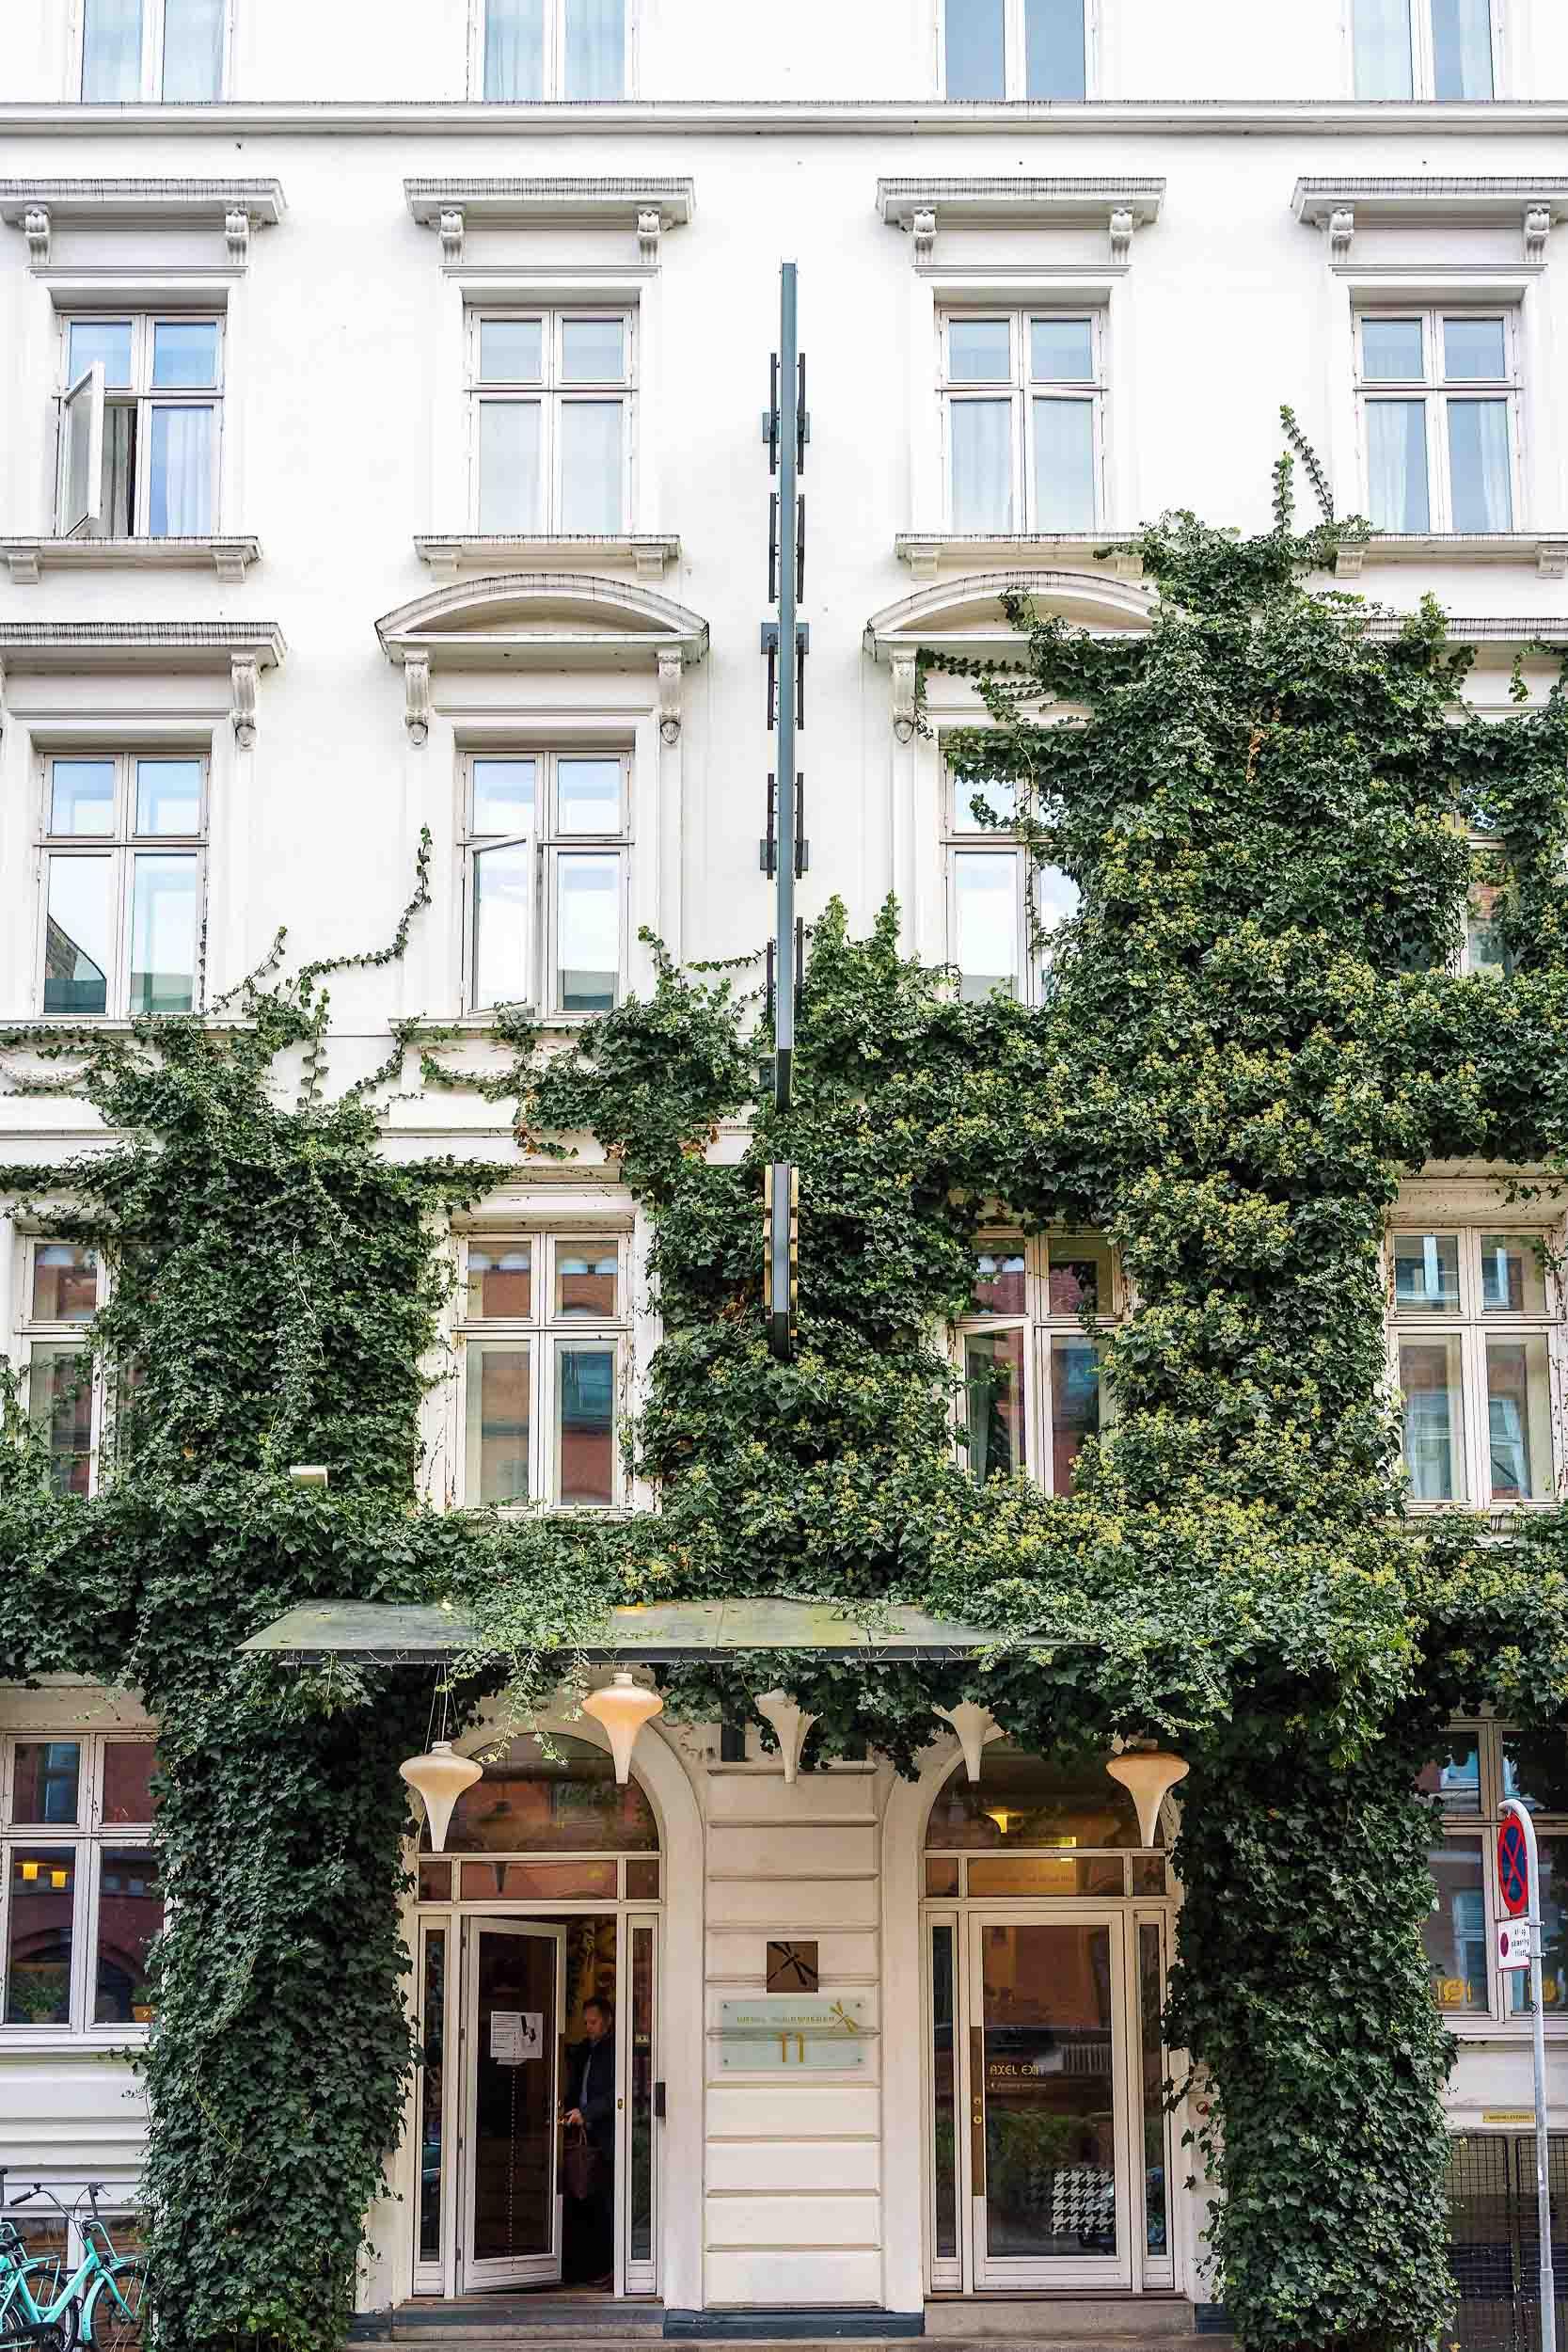 Where to stay in Copenhagen: The ivy-covered exterior at Axel Guldsmeden in Copenhagen